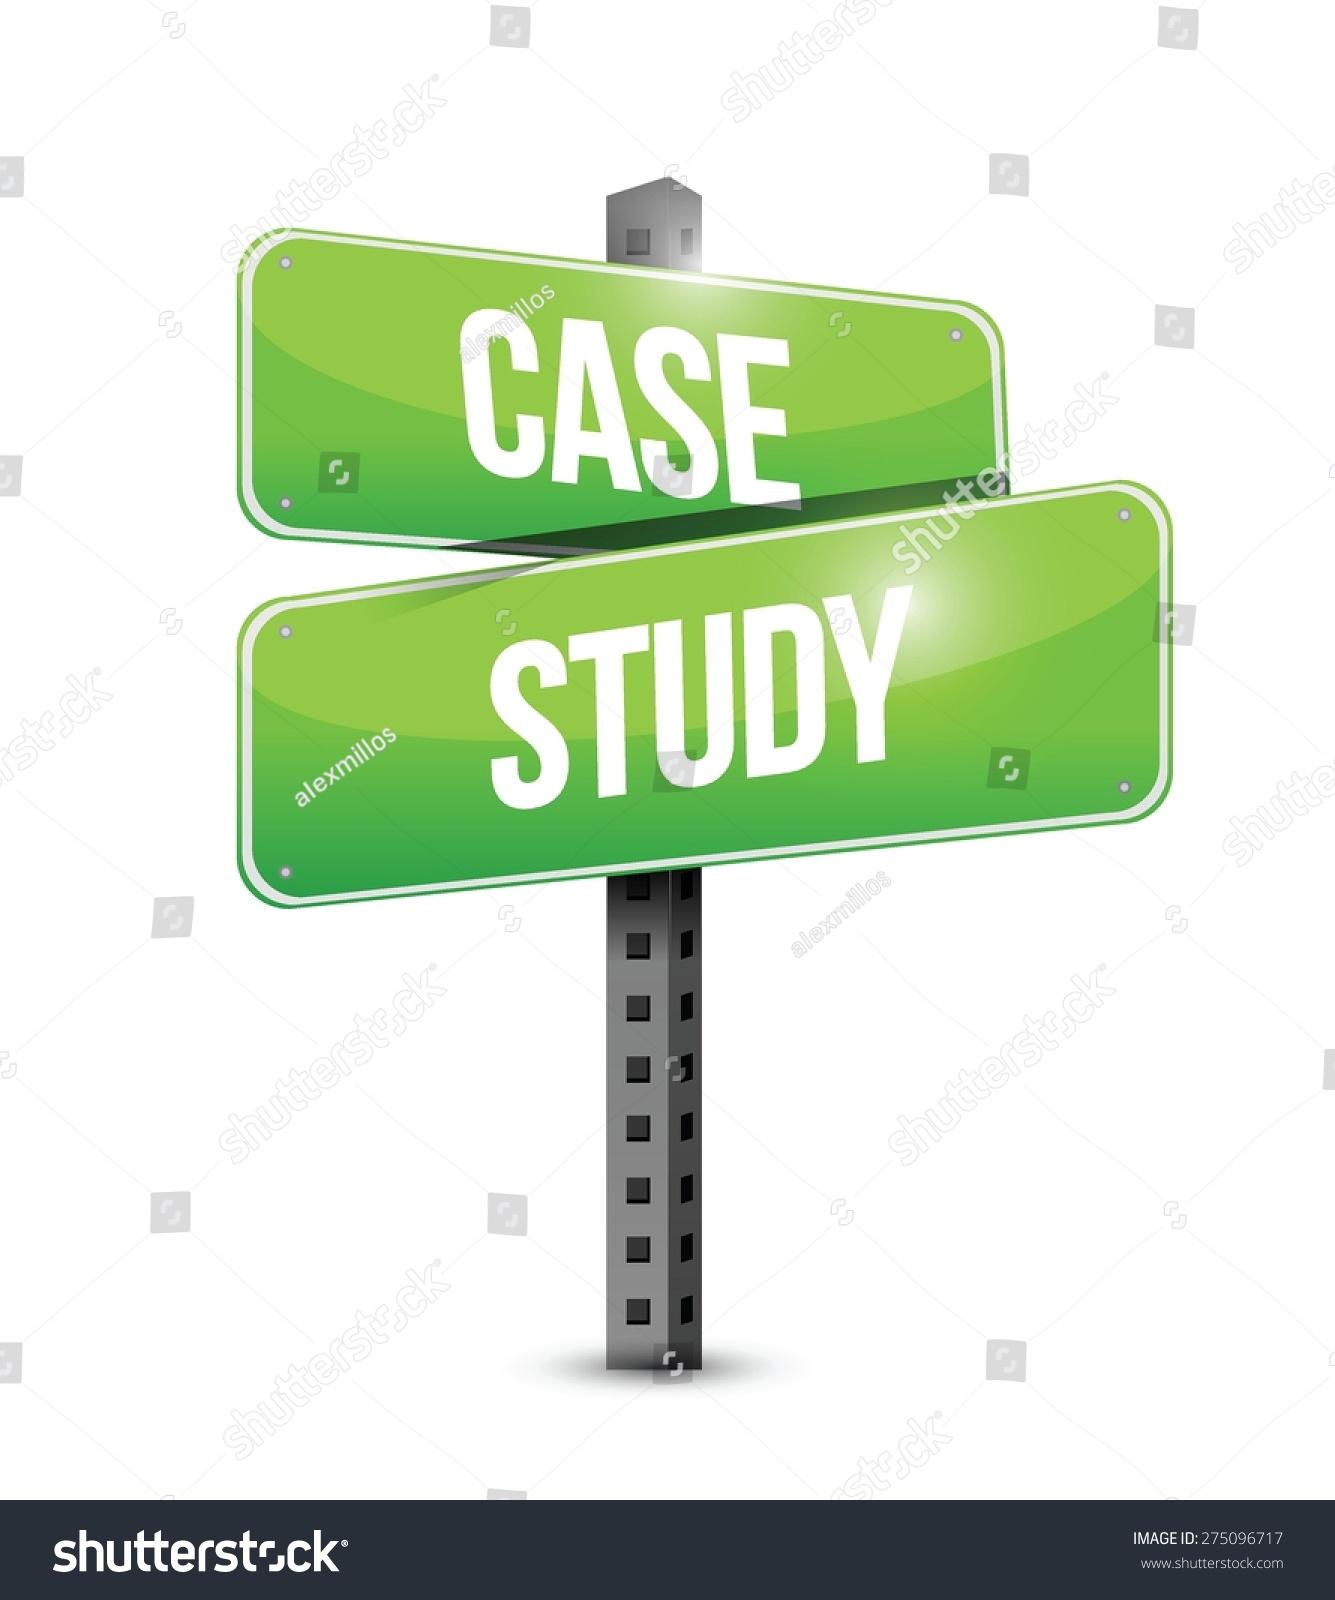 1335x1600 Stock Vector Case Study Street Sign Concept Illustration Design